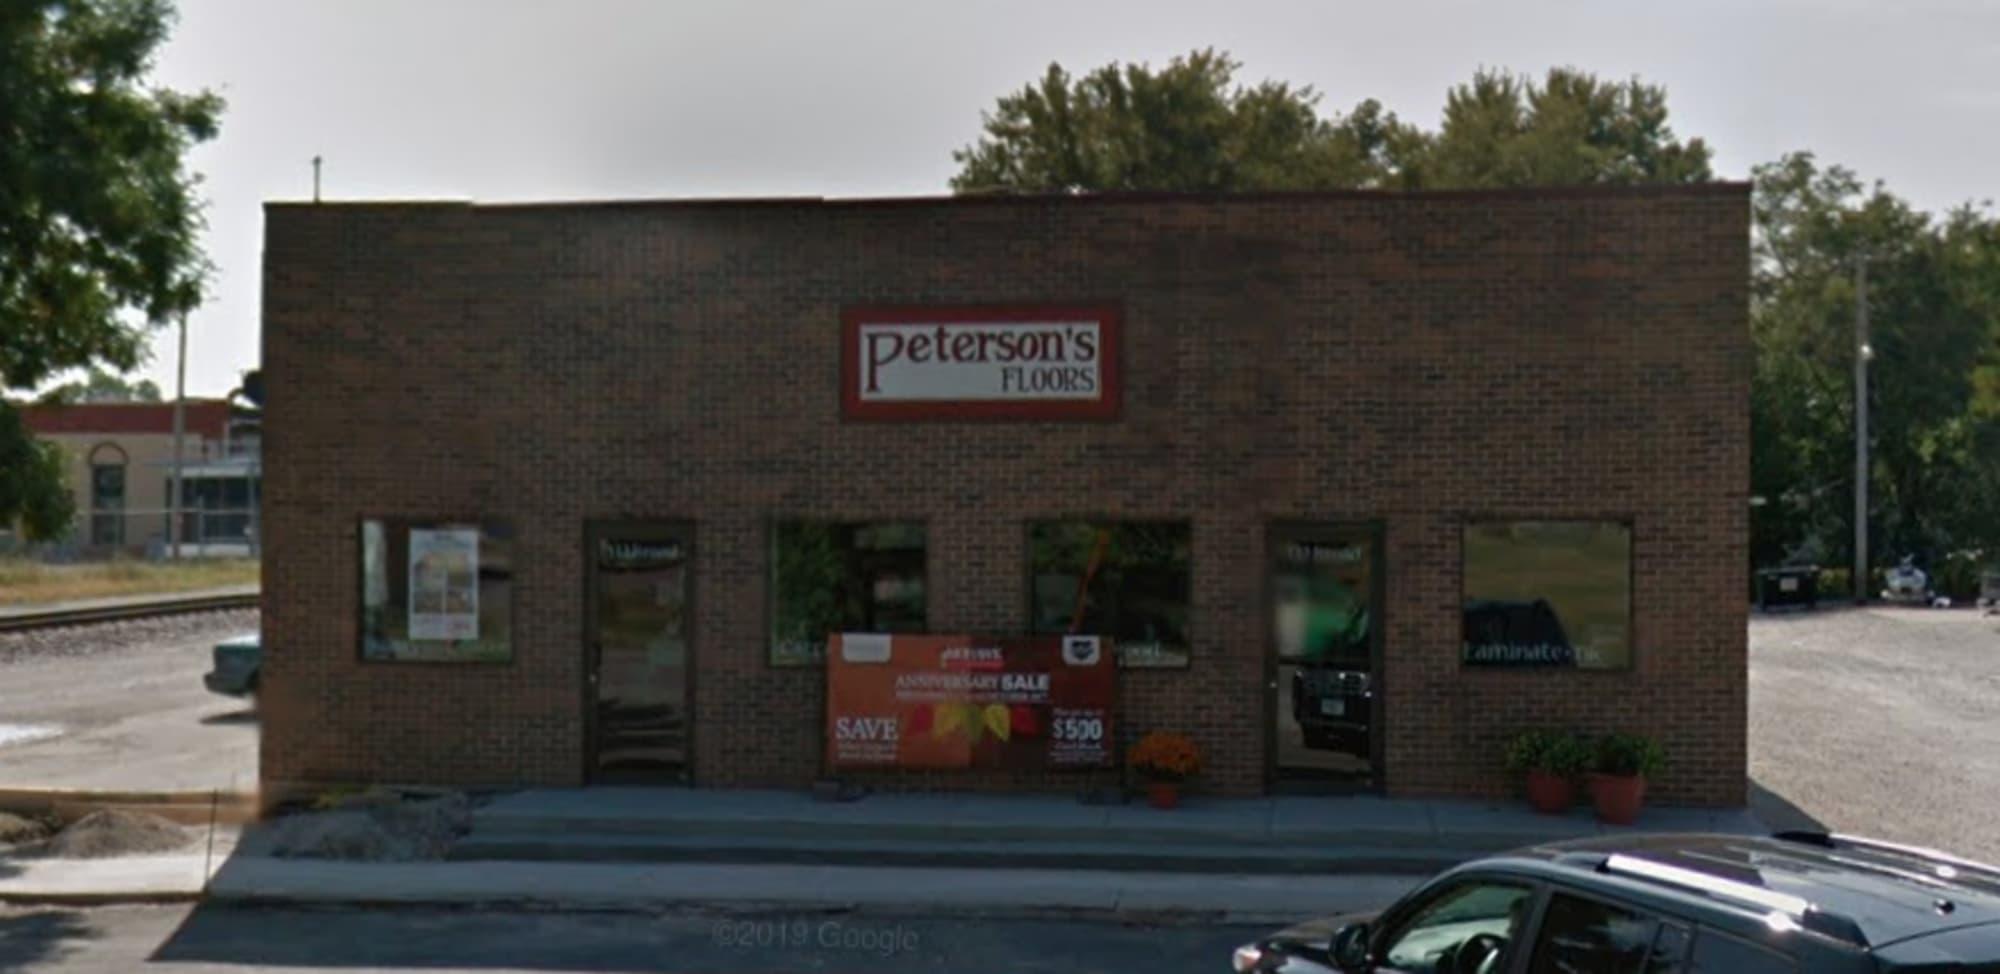 Peterson's Floors - 132 Broad St Story City, IA 50248